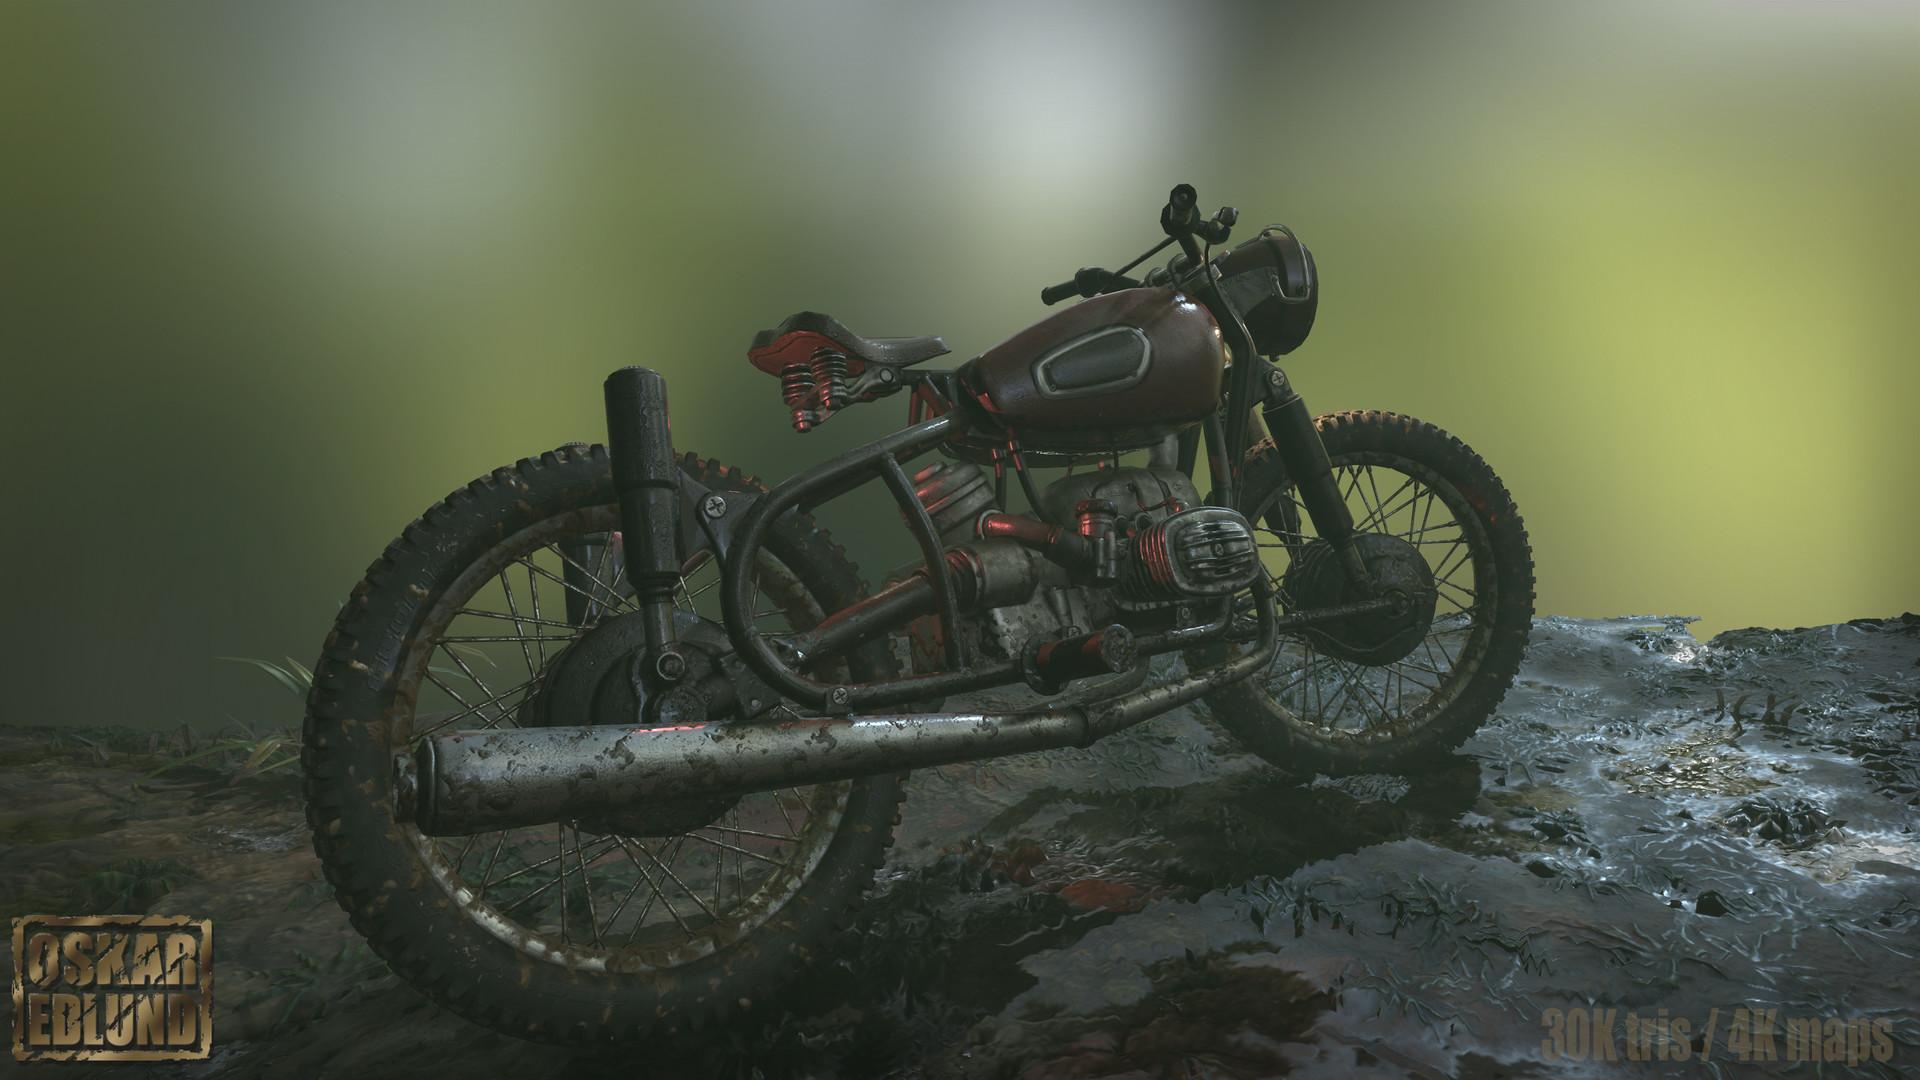 Oskar edlund bike 03